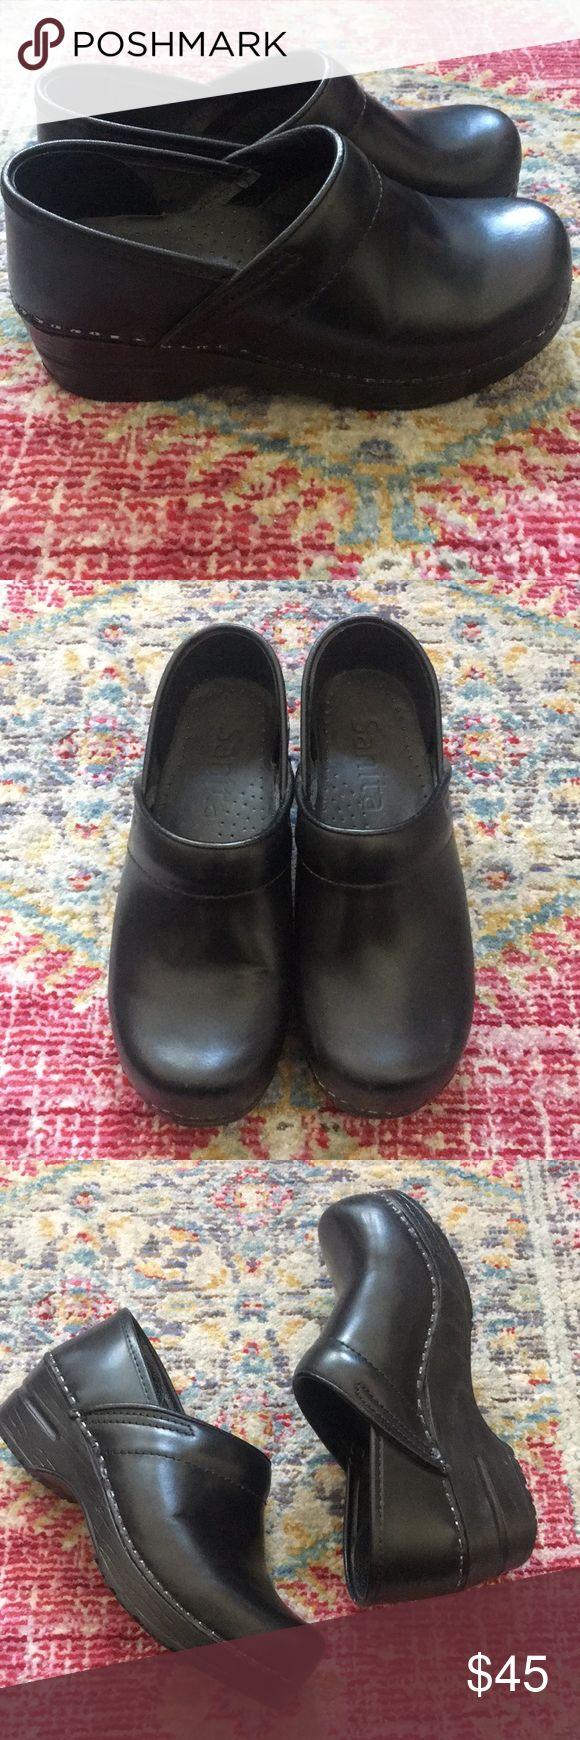 Sanita black leather clogs size 35 Sanita black leather clogs size 35. Gently used no box Sanita Shoes Mules & Clogs